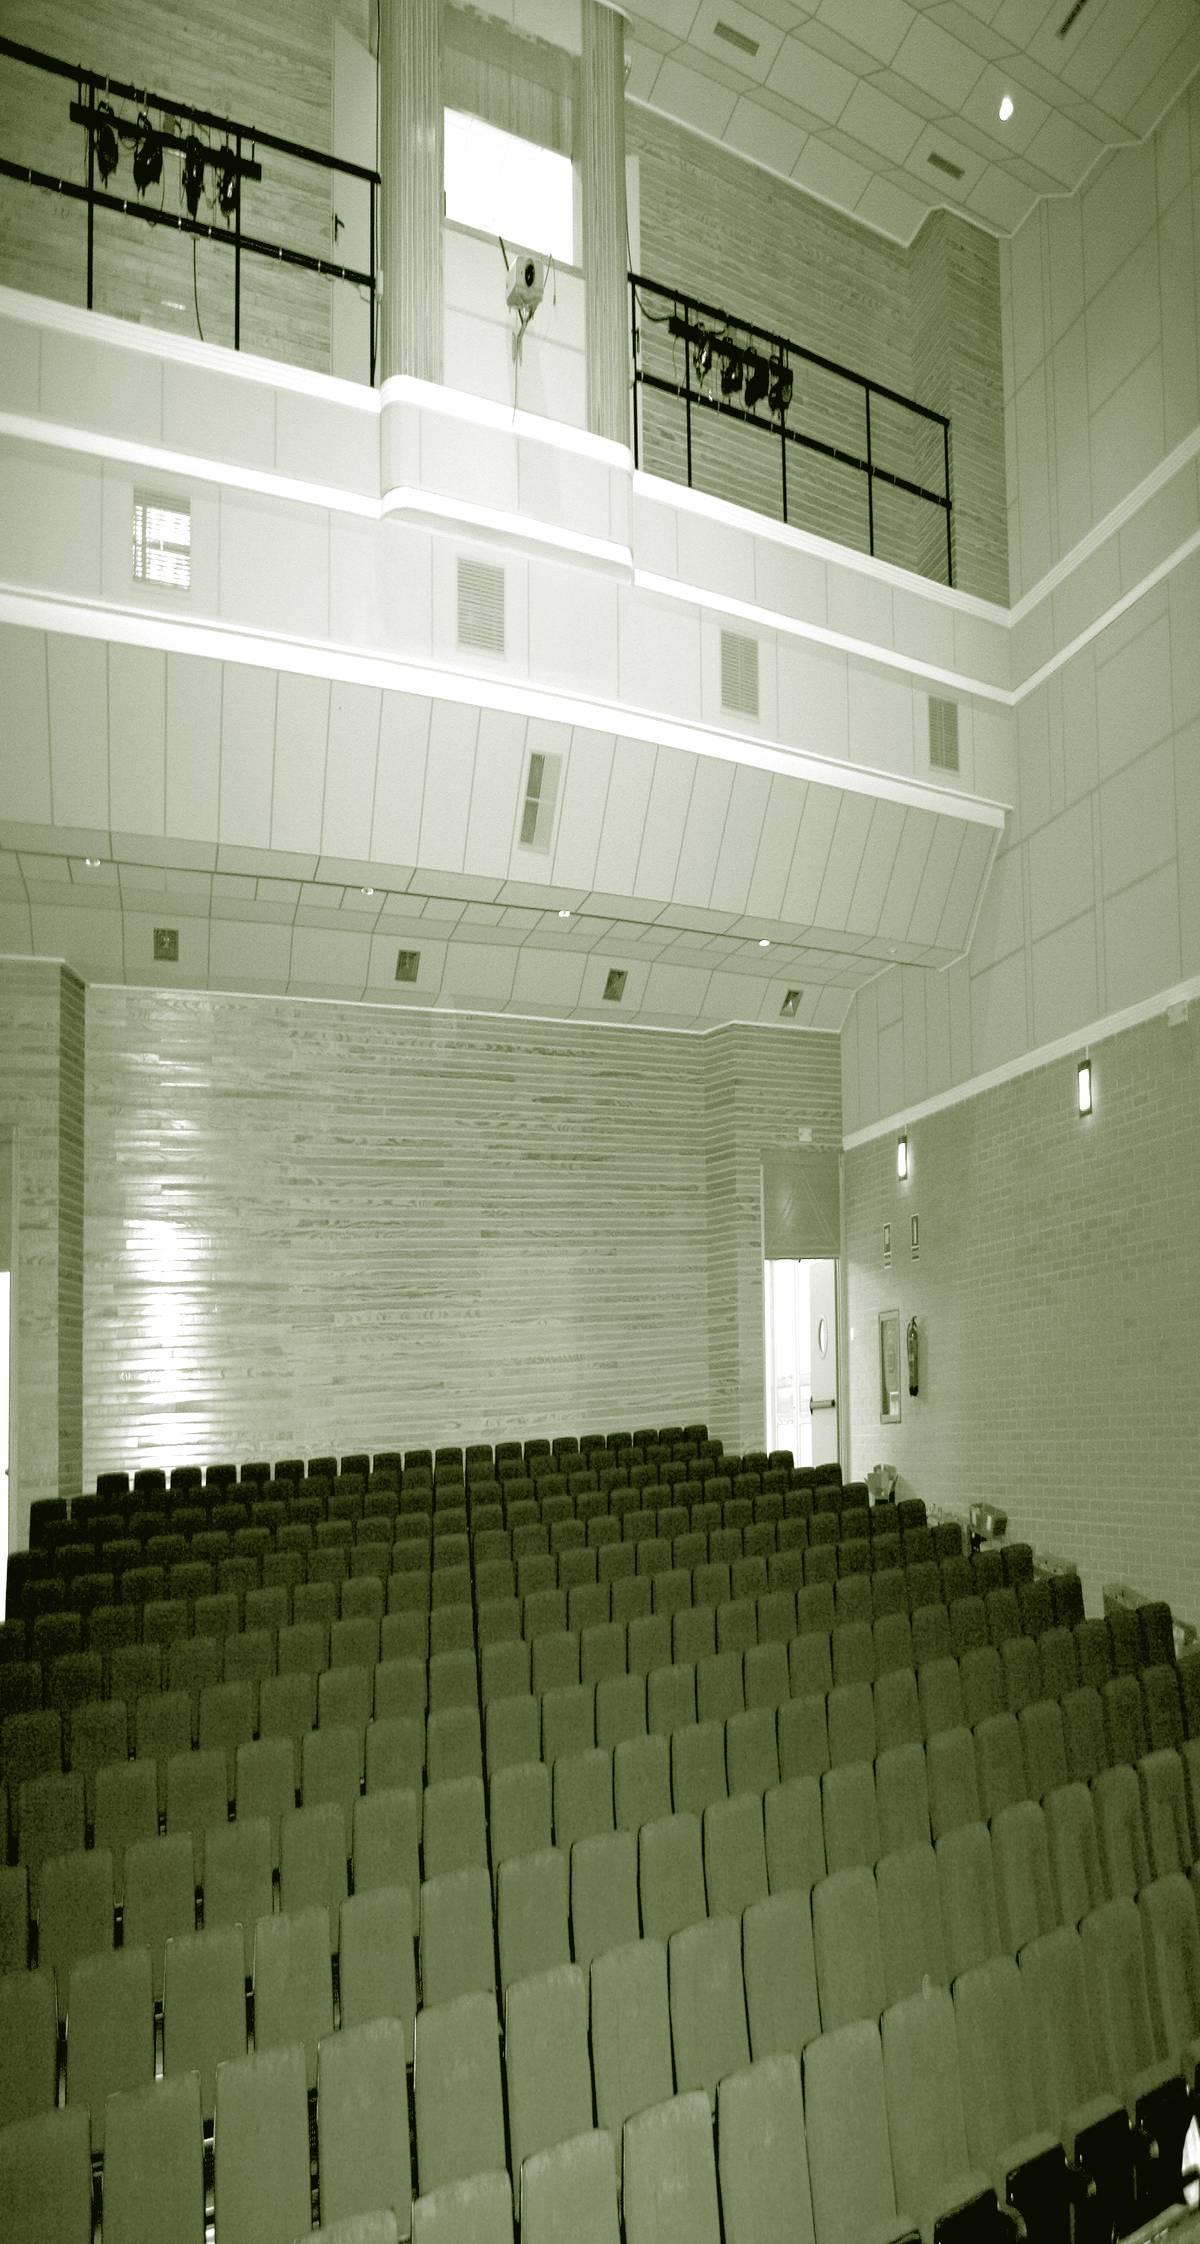 Teatro Auditorio Municipal de Lietor